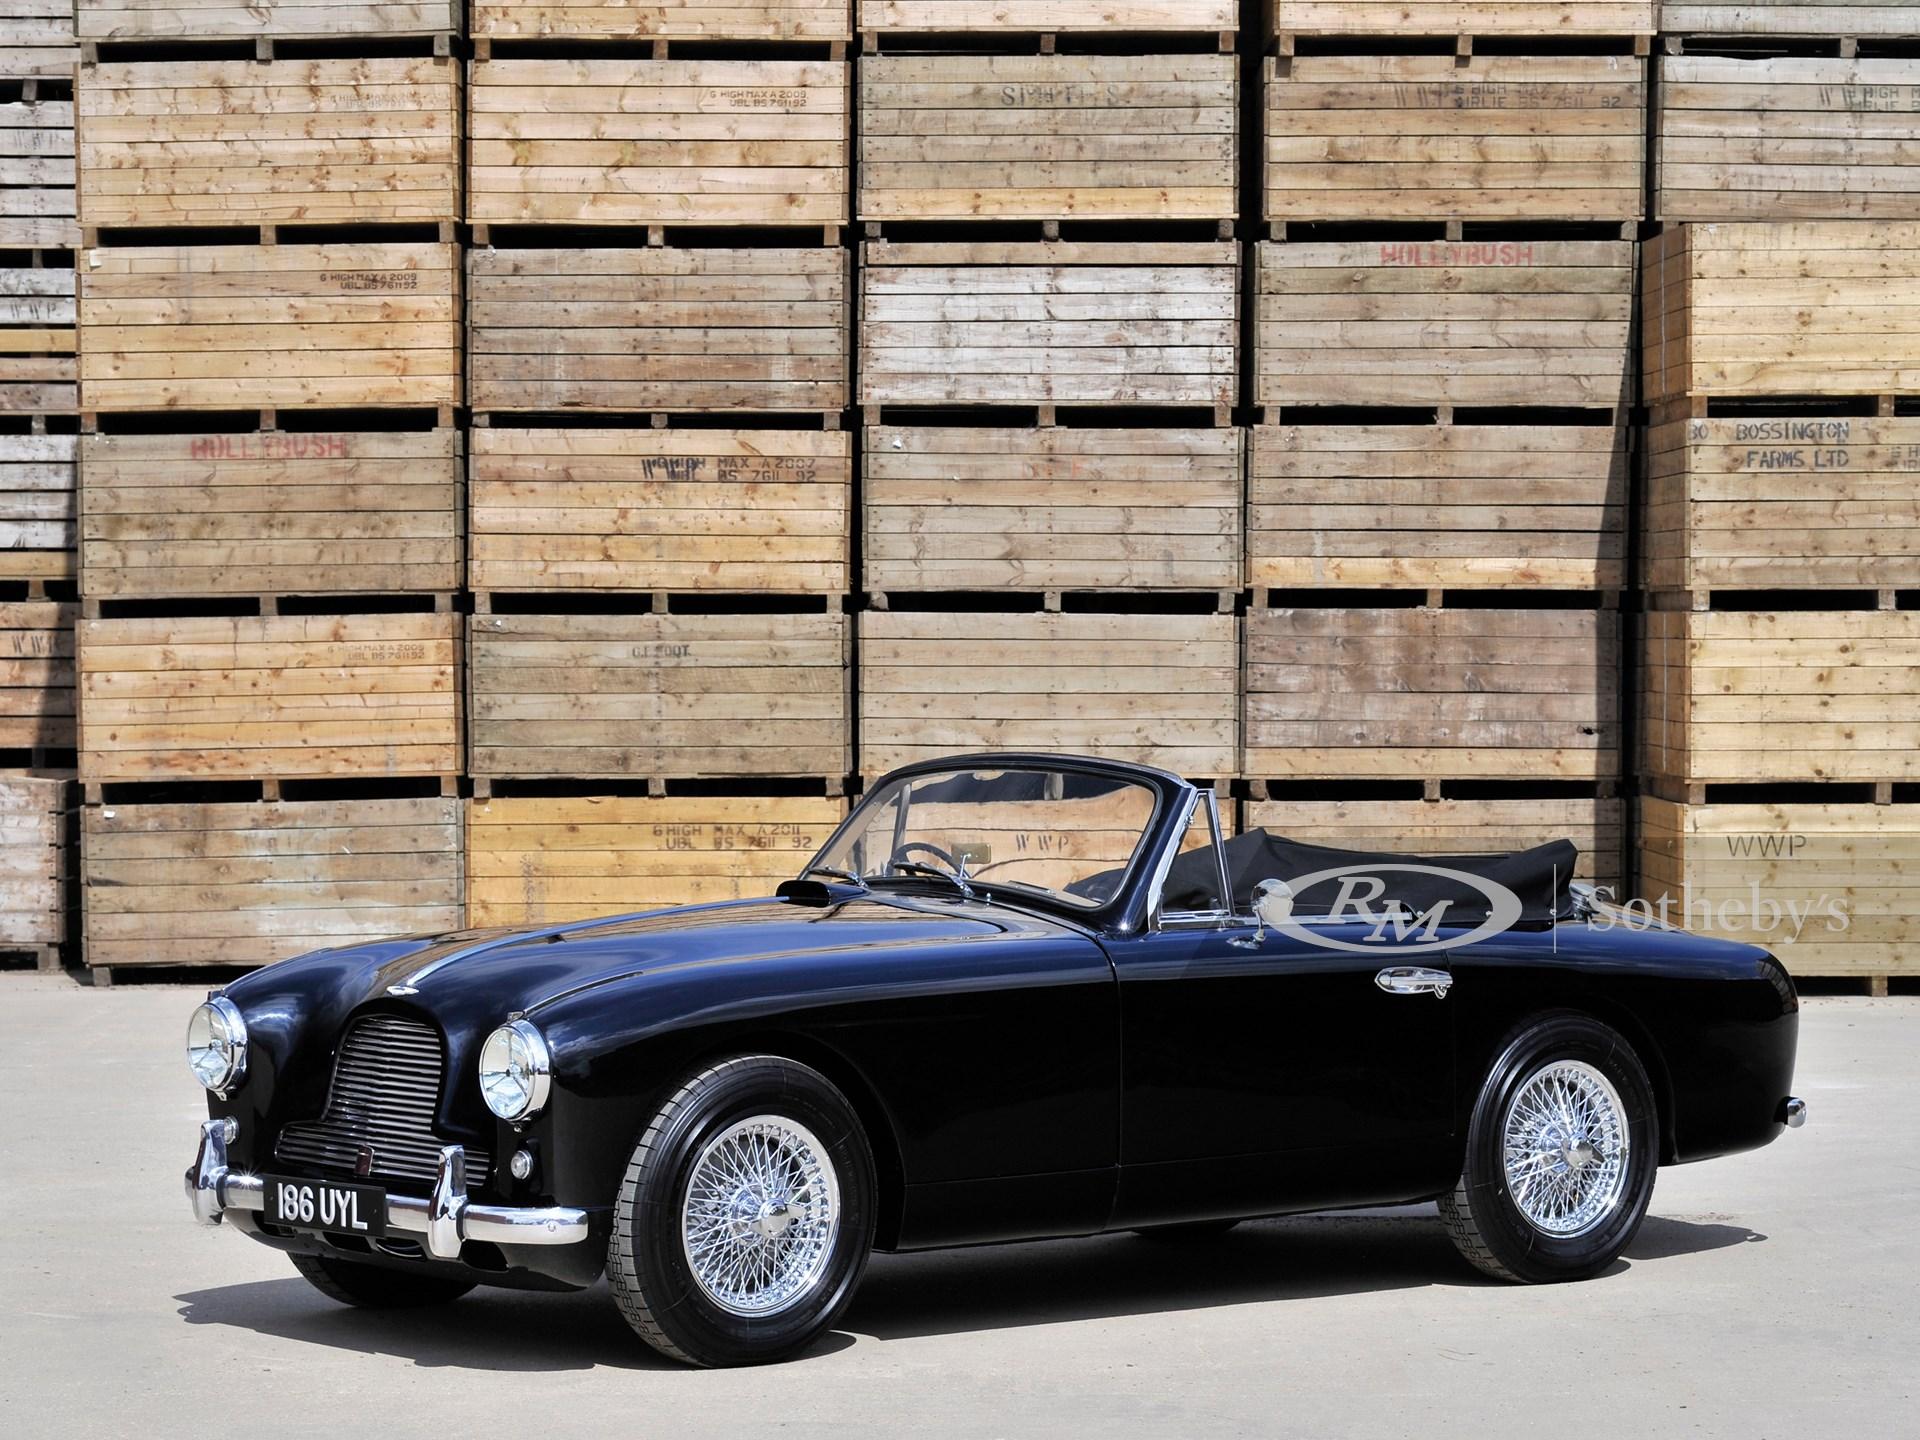 1954 Aston Martin Db2 4 Drophead Coupé London 2015 Rm Sotheby S